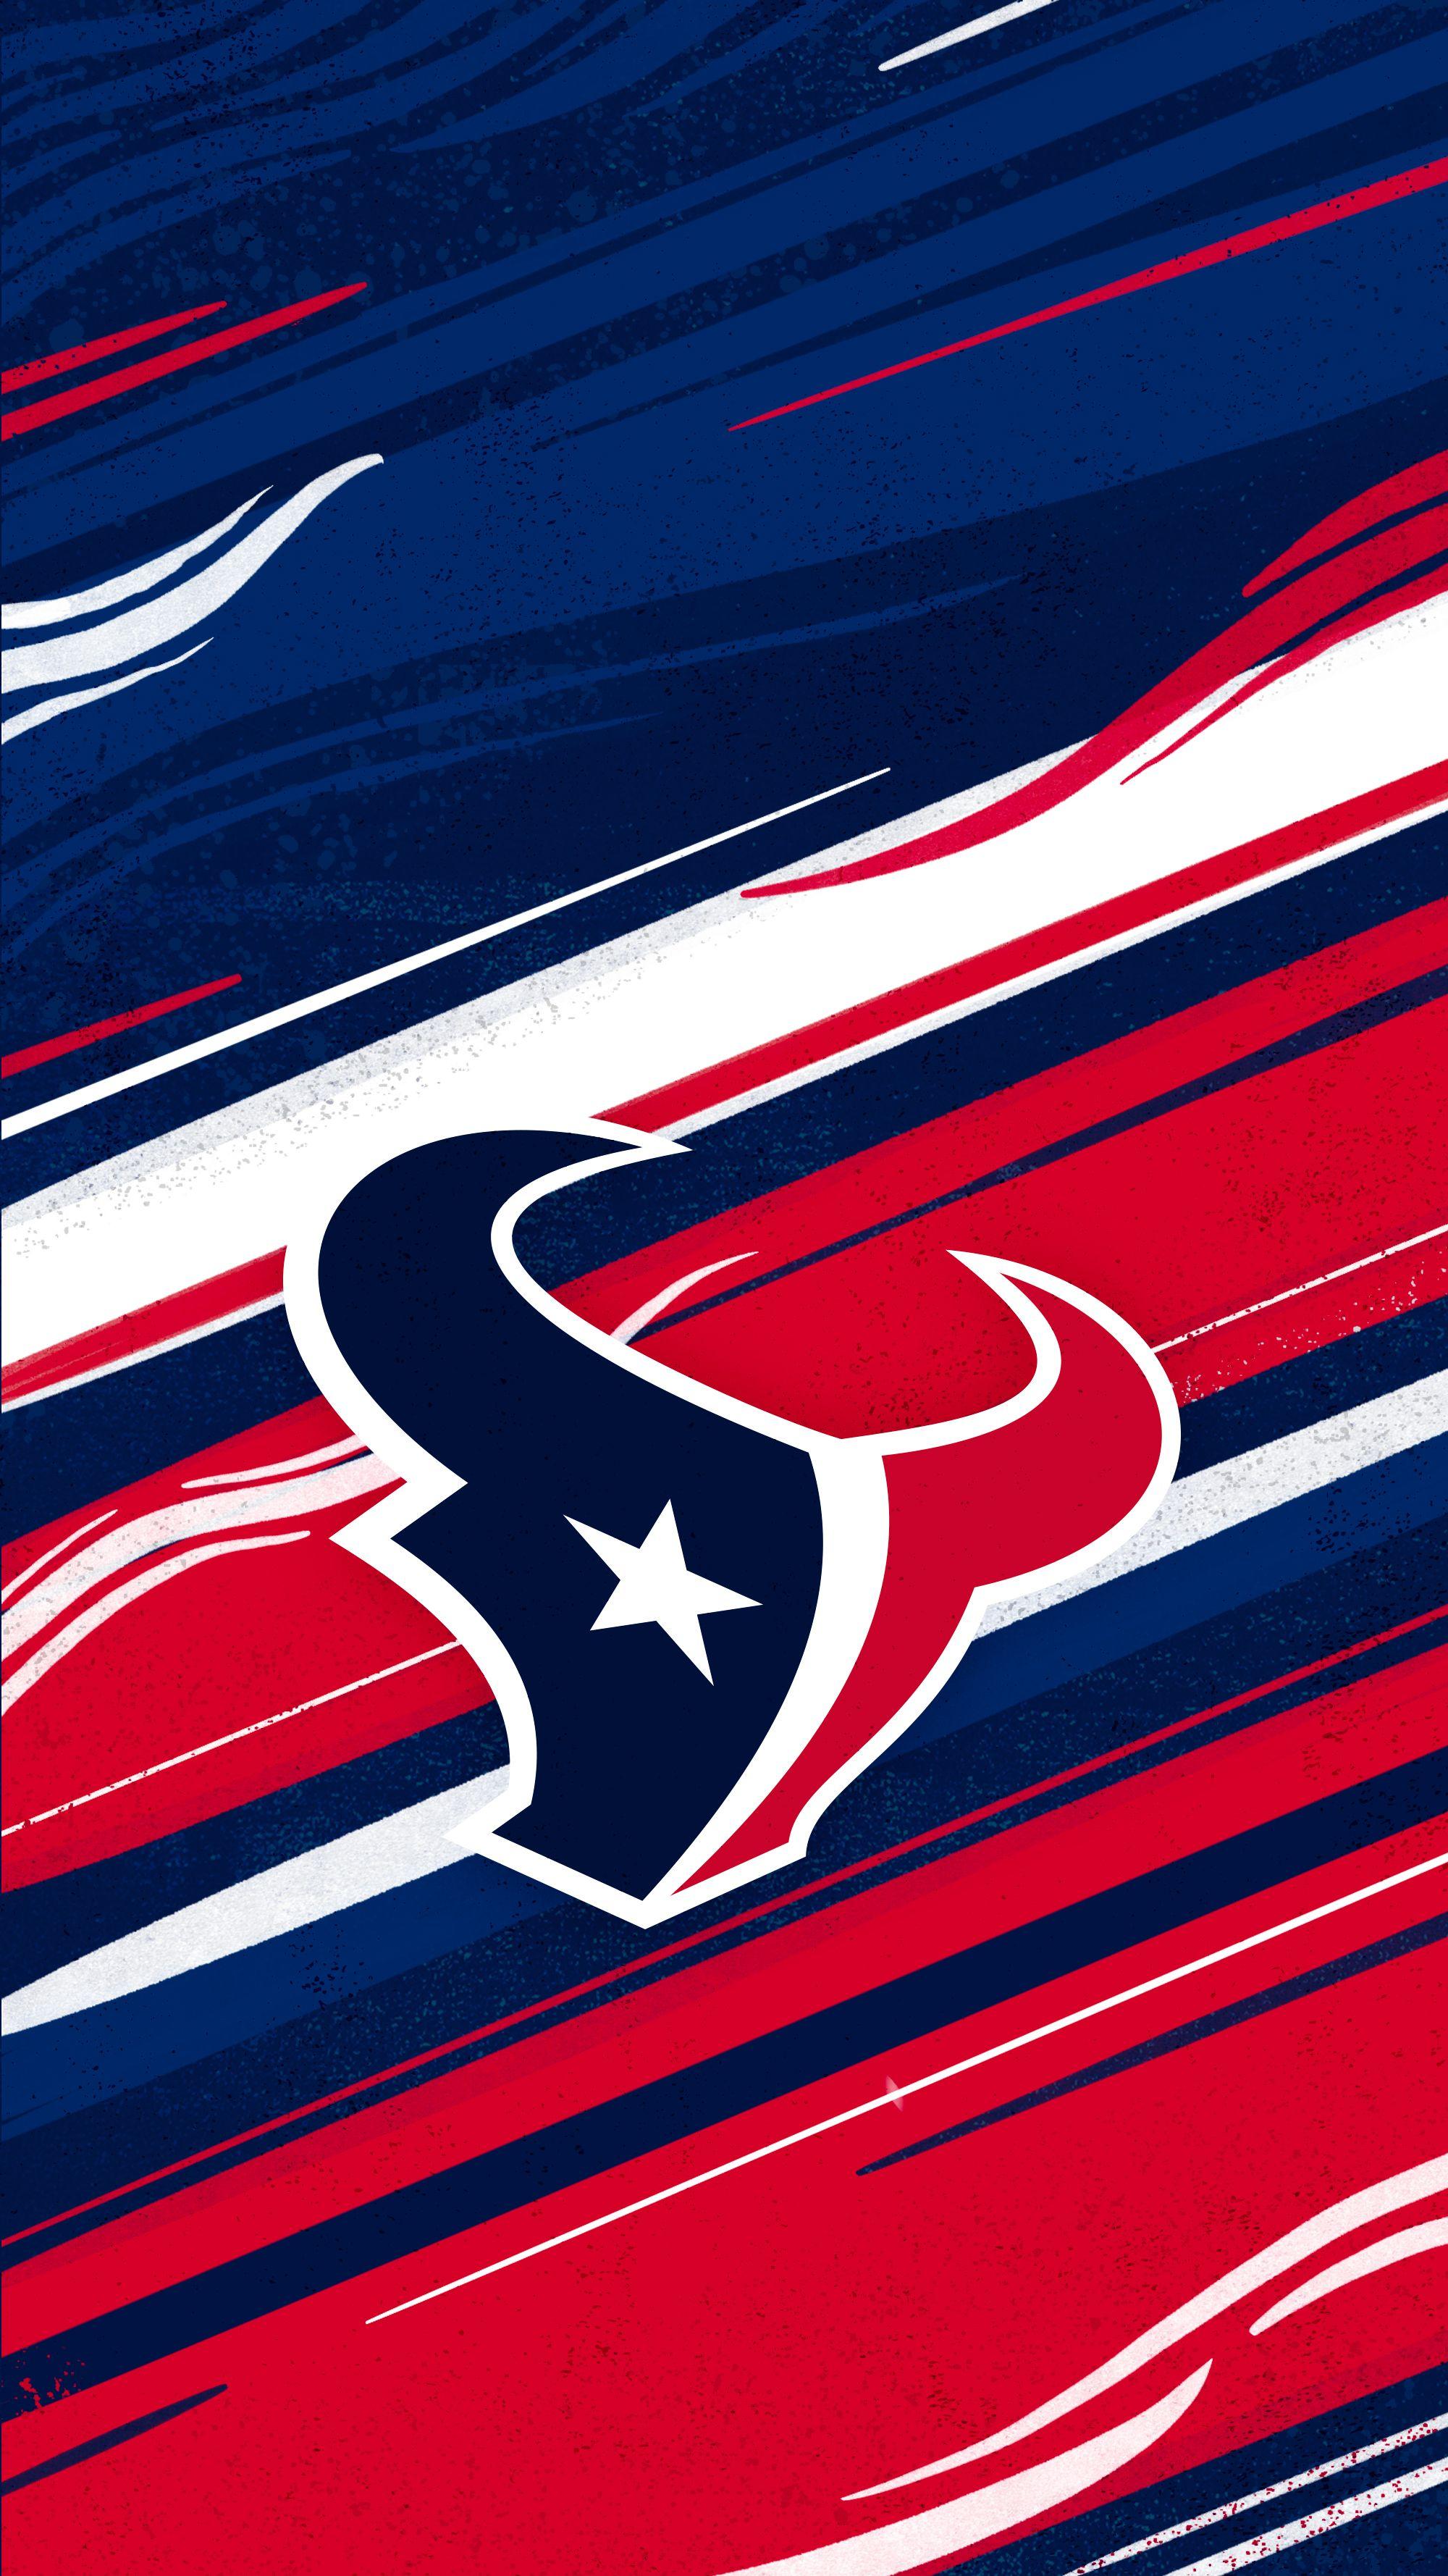 Wallpaper Wednesday Houston Texans Football Texans Football Houston Texans Football Logo